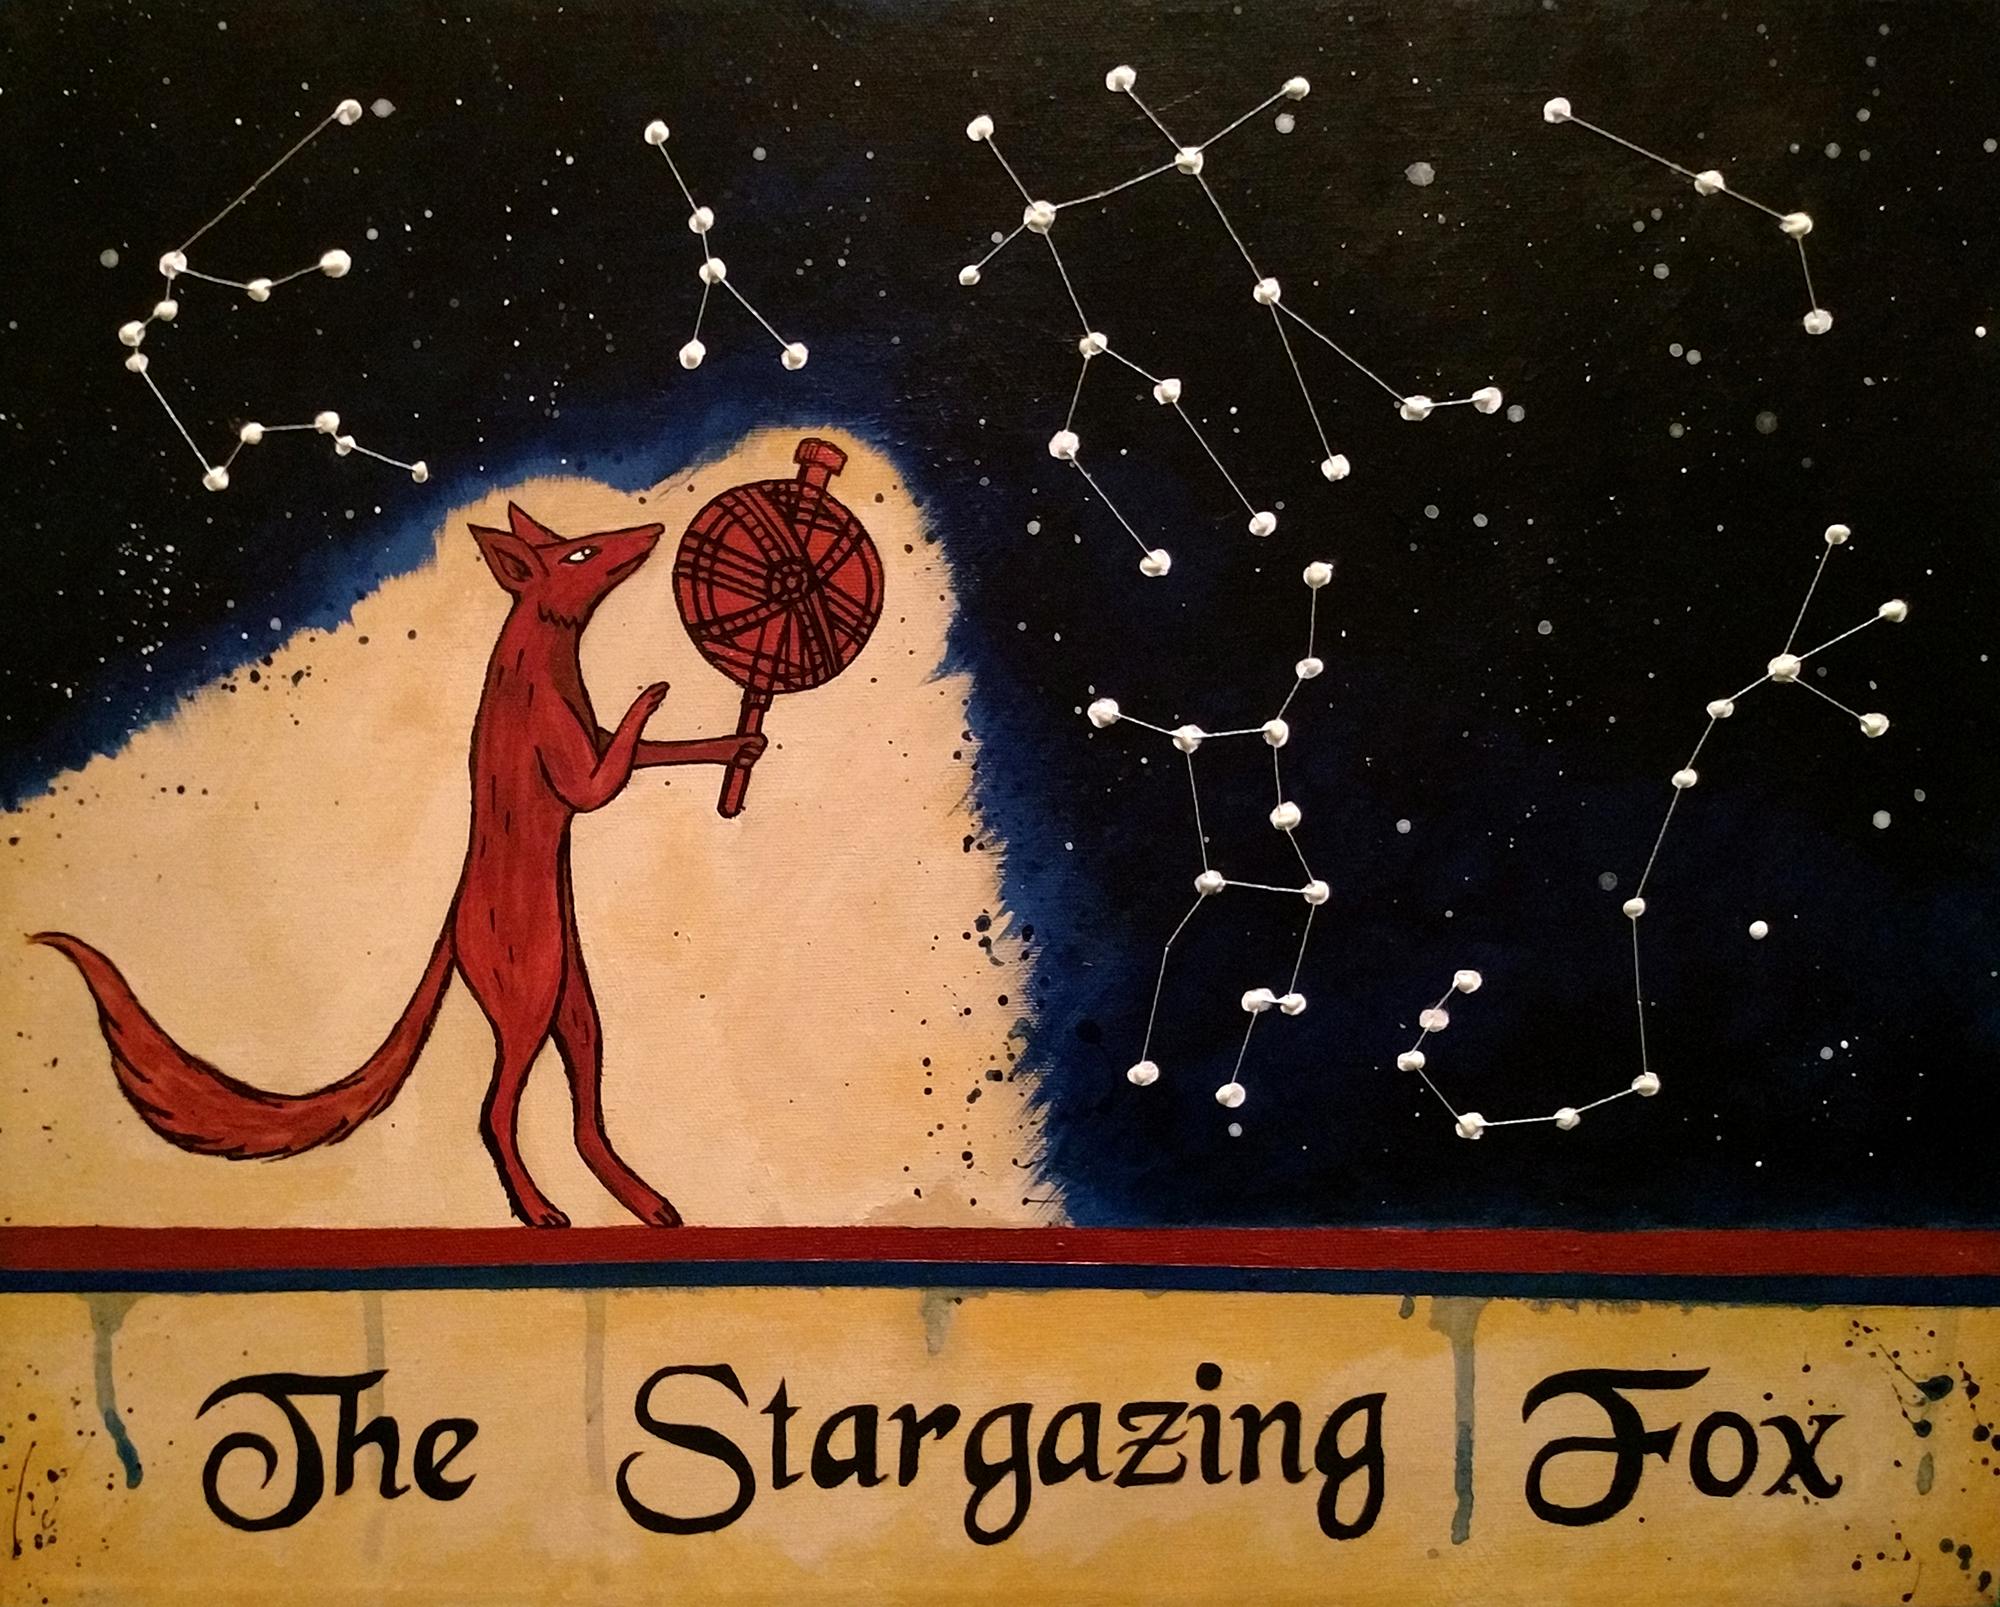 The Stargazing Fox banner image